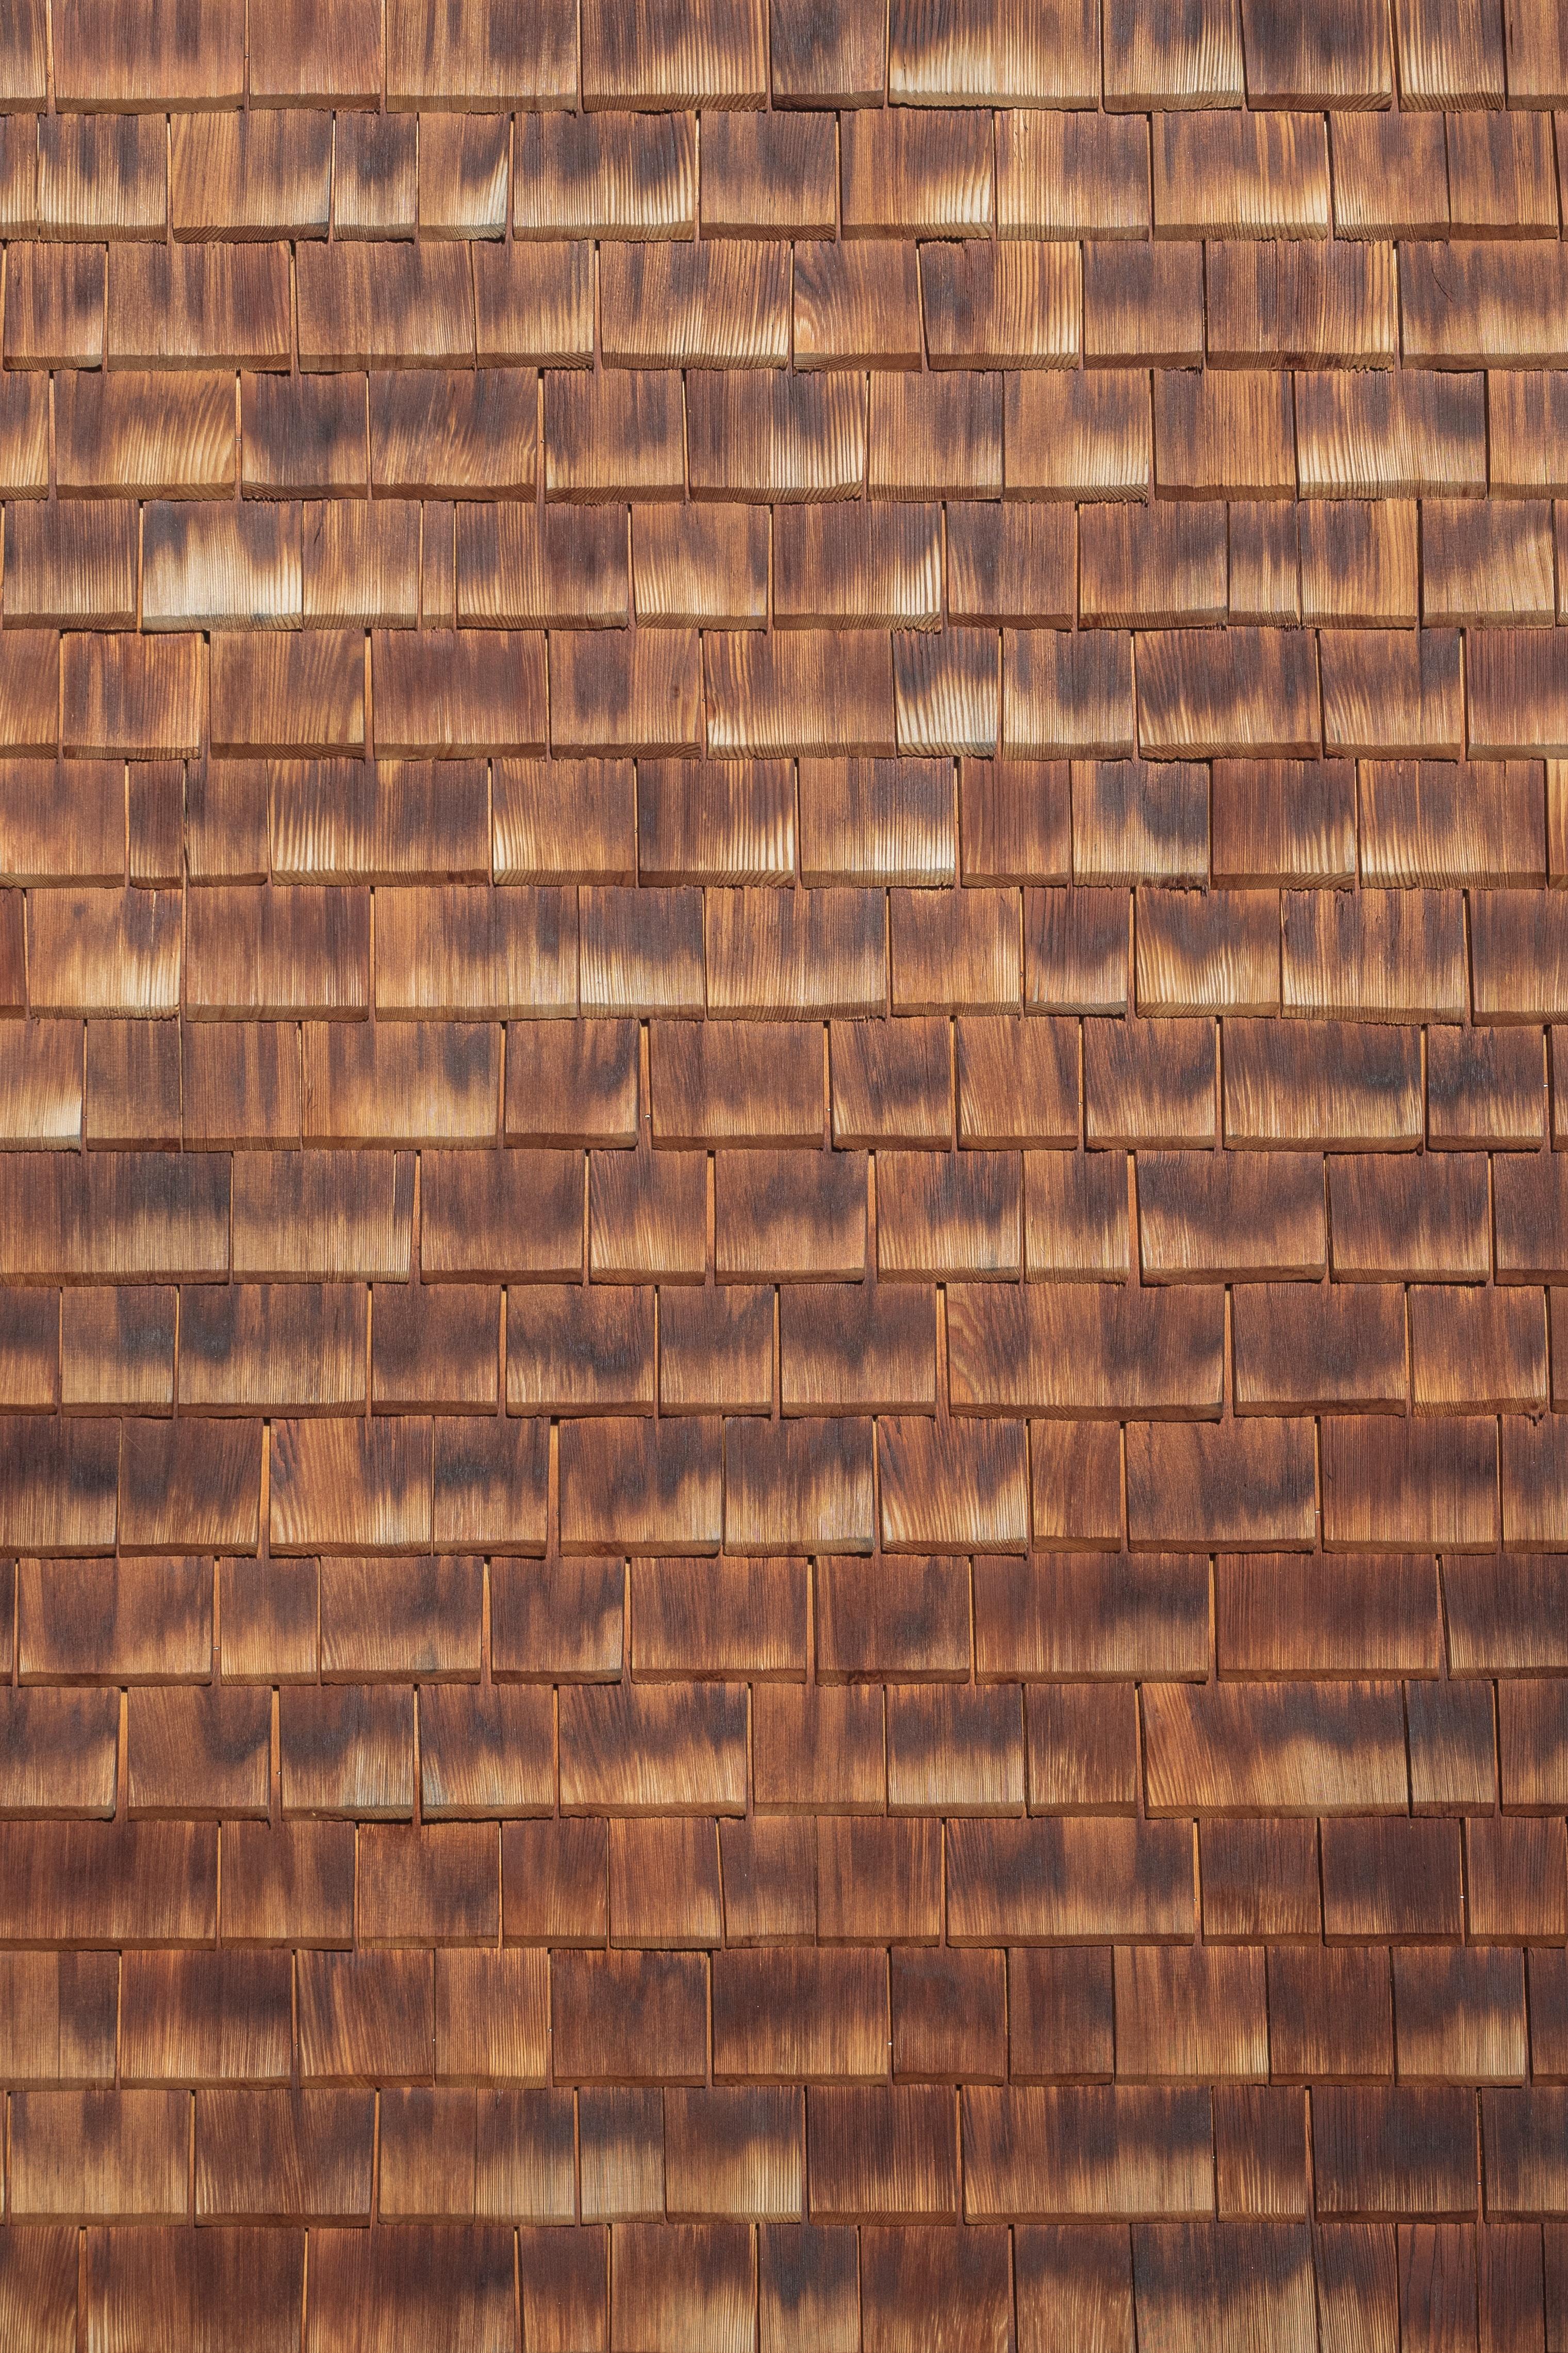 Wood floor covering maison design for Hardwood floor covering